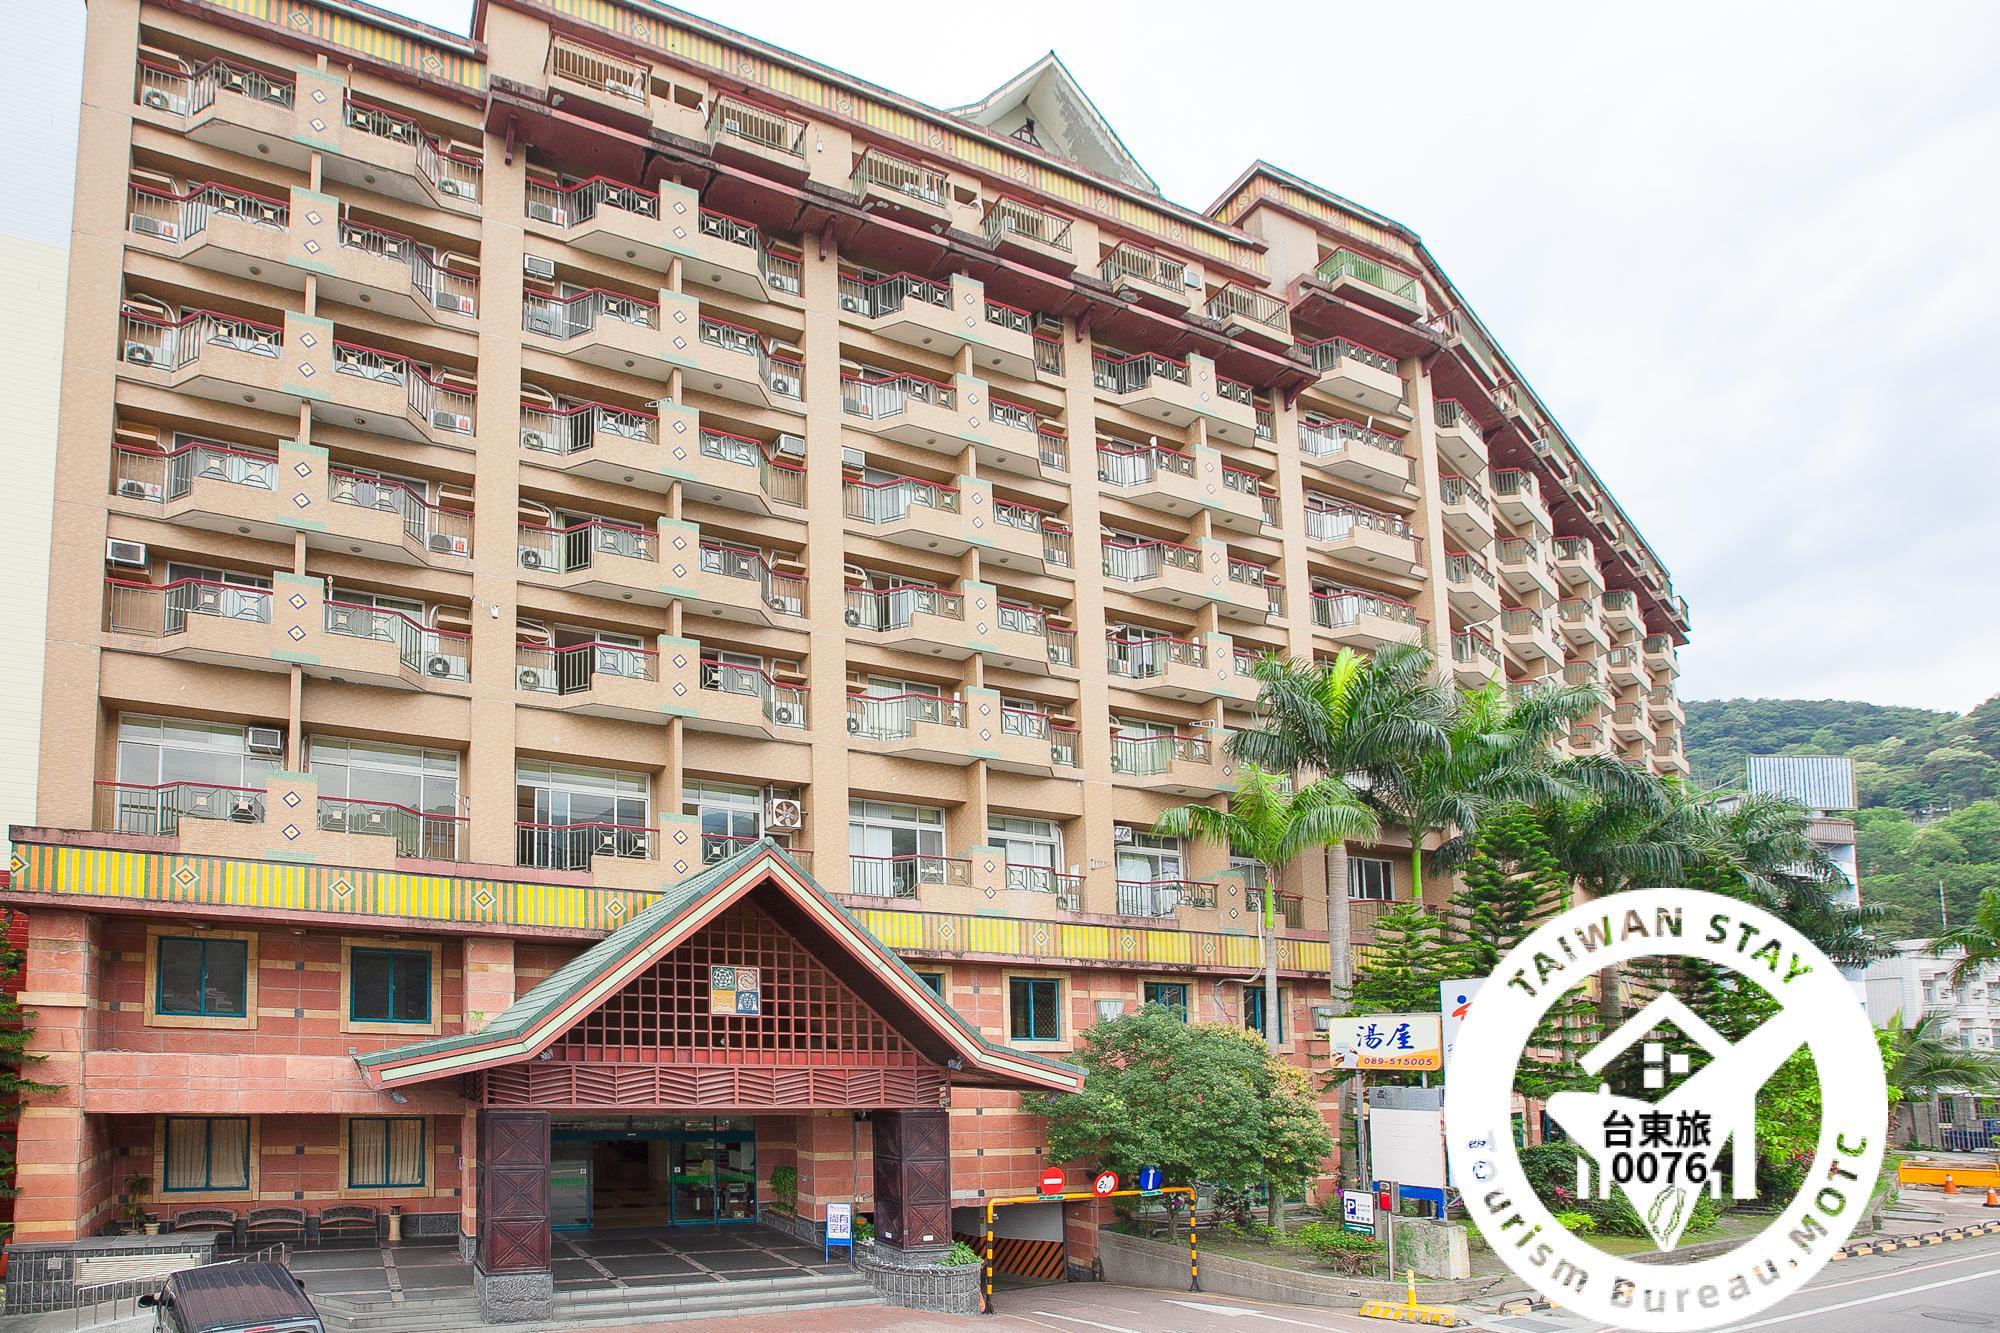 GOYA HOT SPRINGS HOTEL & SPA